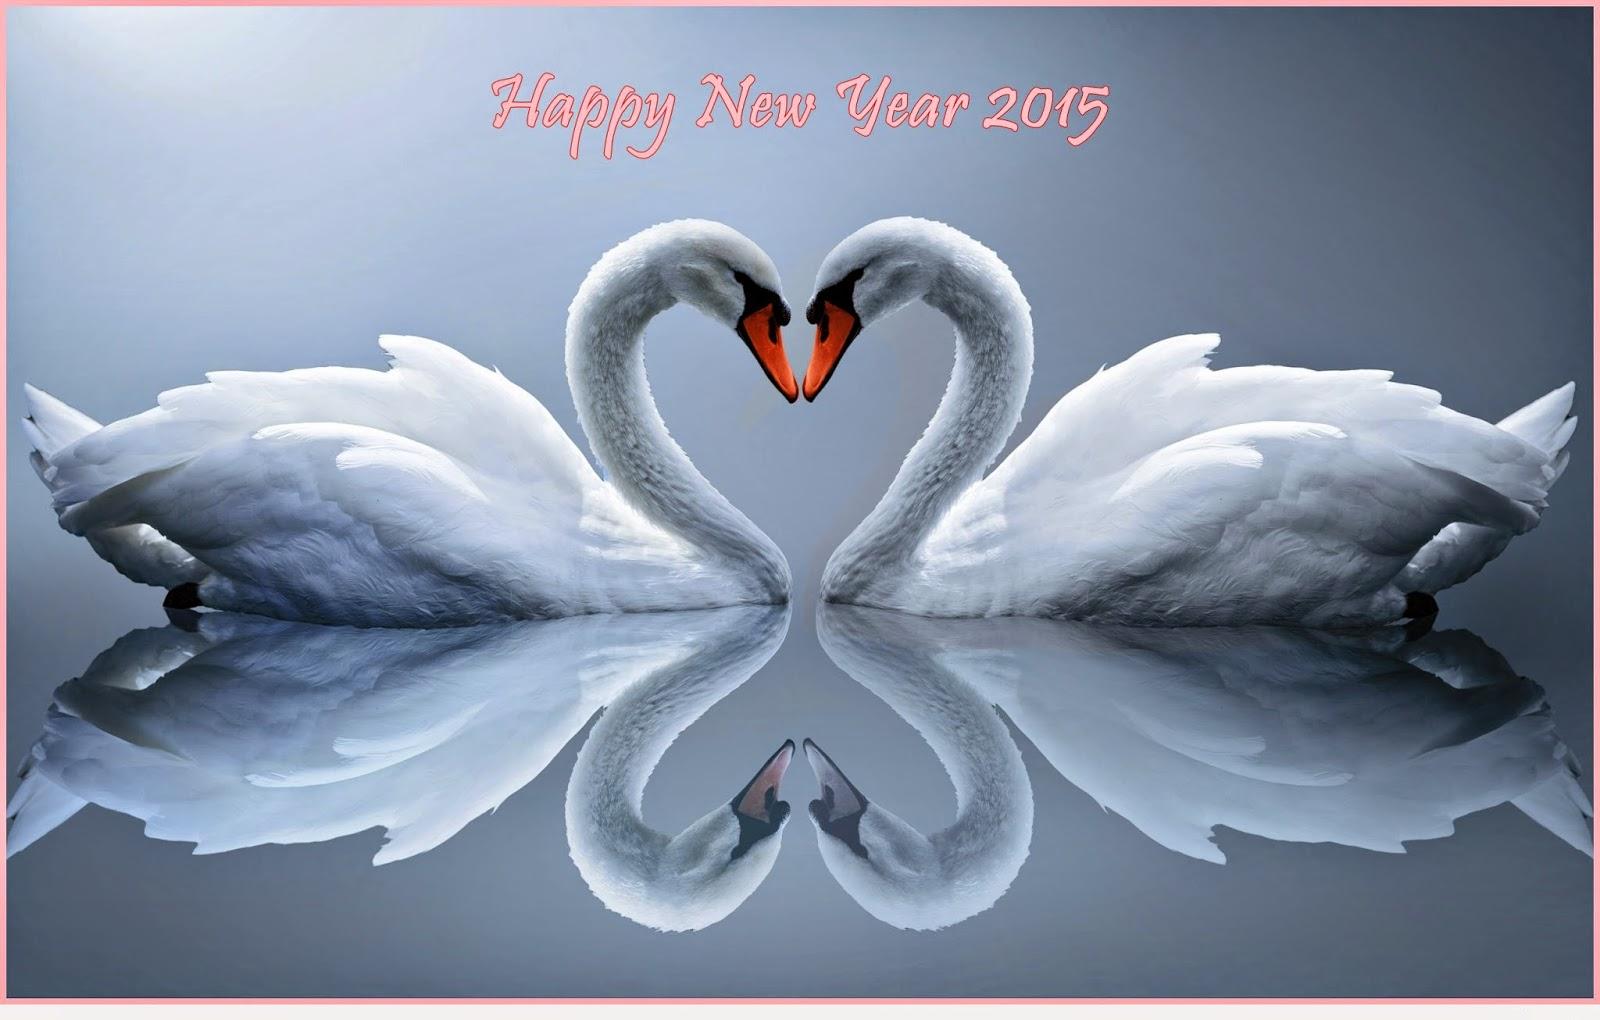 Happy new year wallpaper 2014 hd nornasfo happy new year 2015 new happy new year nice hd wallpapers happy voltagebd Choice Image